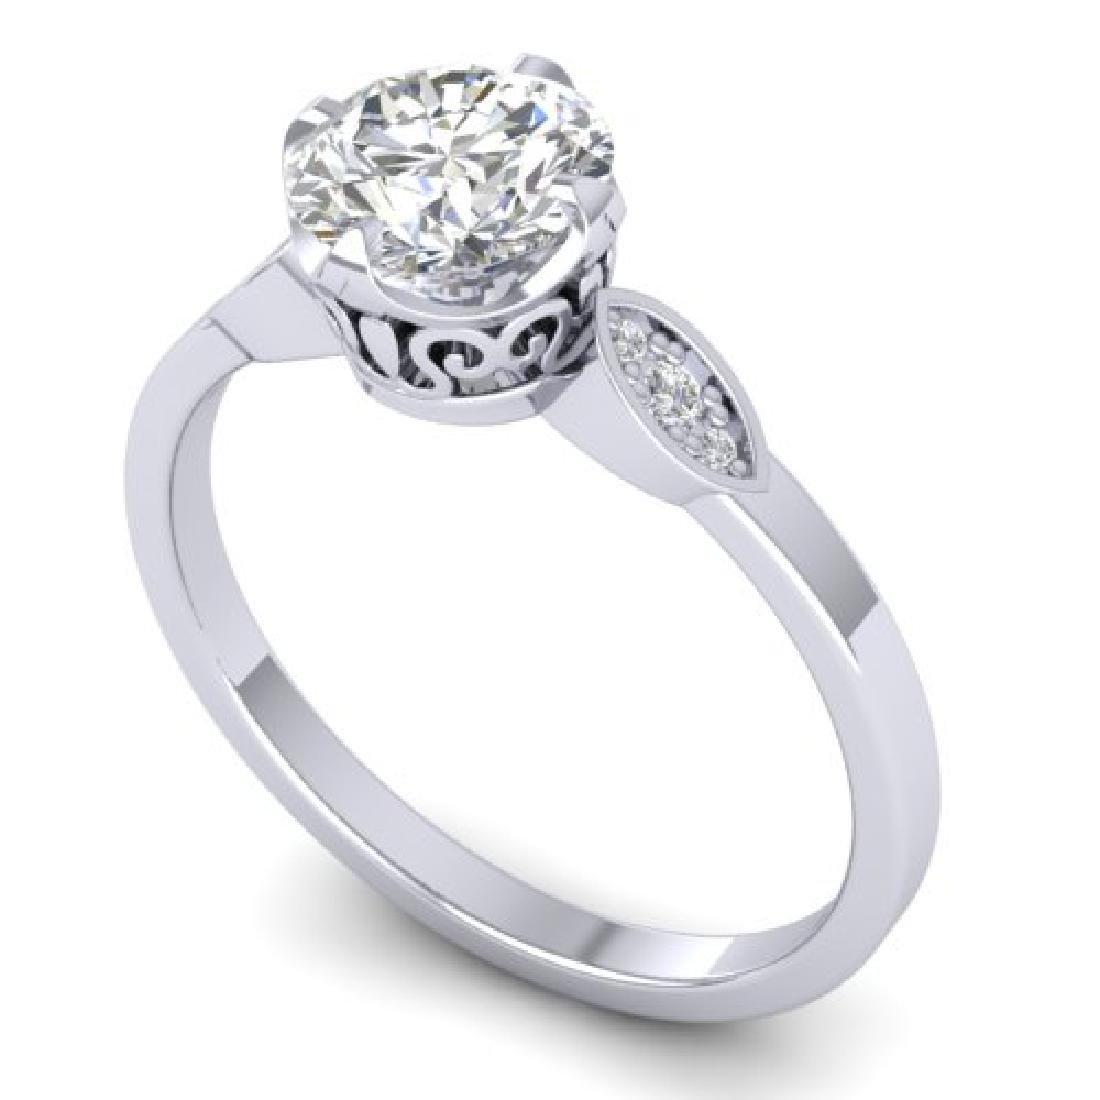 1.05 CTW Certified VS/SI Diamond Solitaire Art Deco - 2